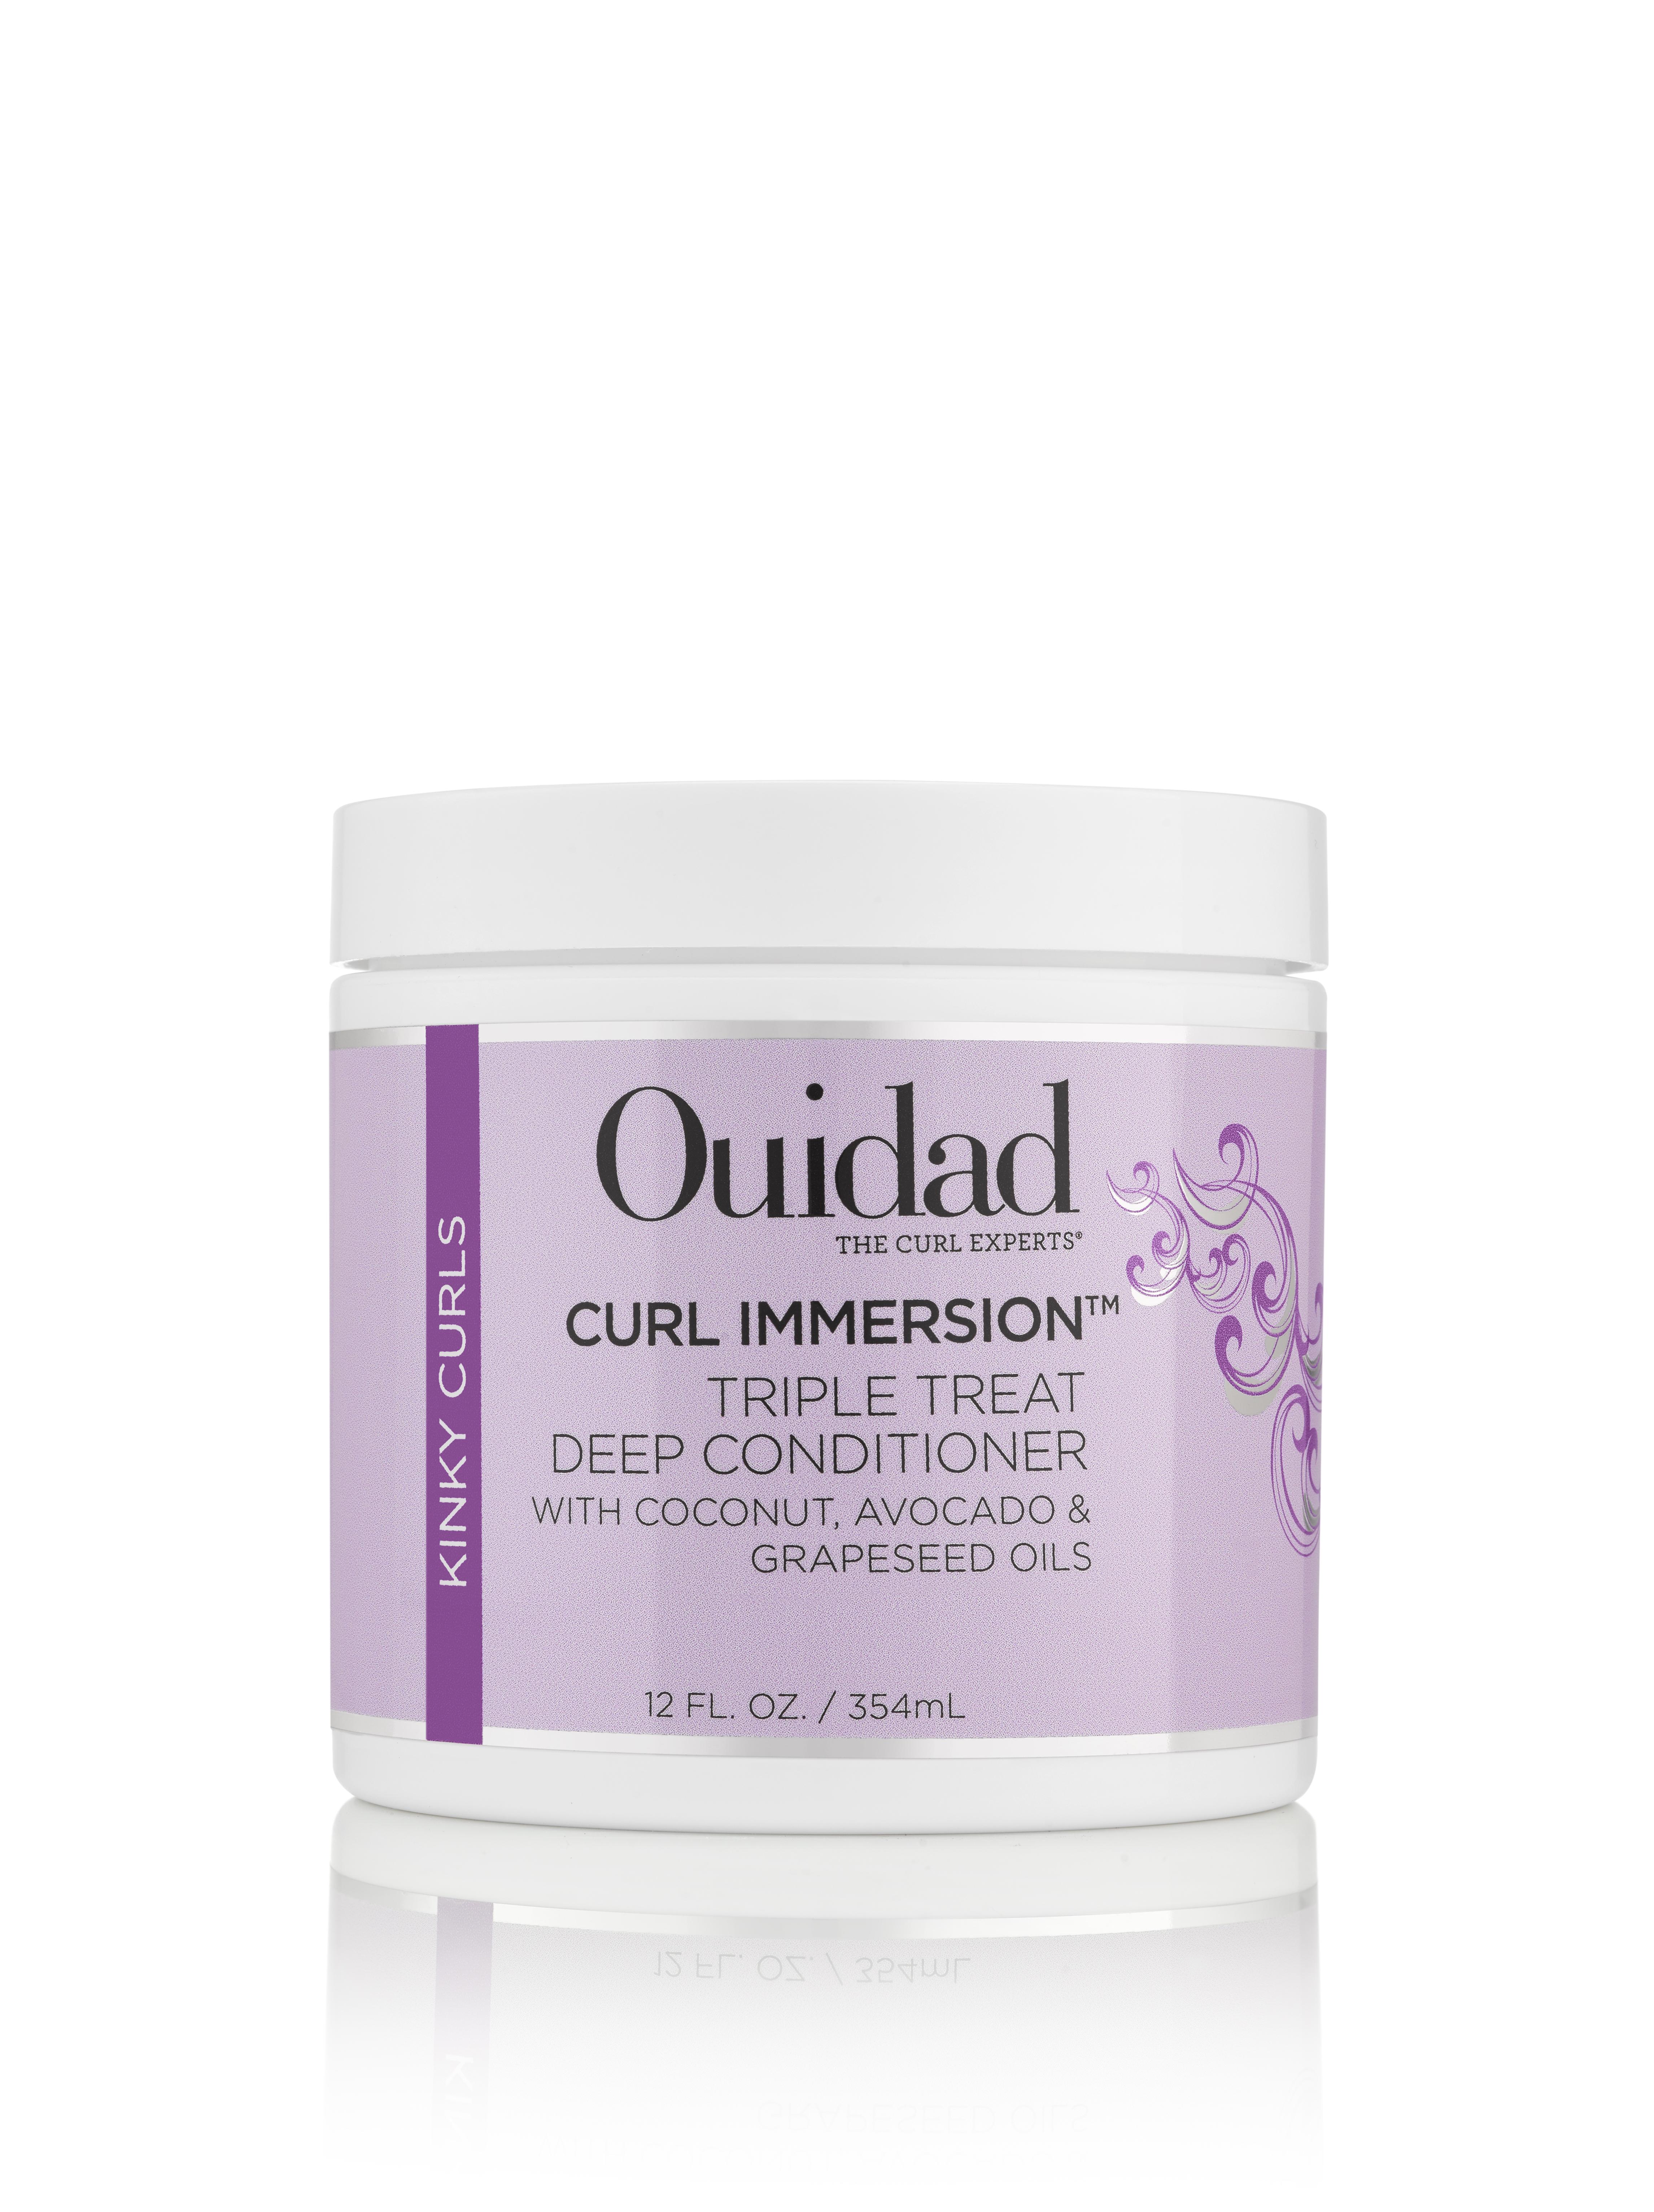 Ouidad Curl Immersion™ Triple Treat Deep Conditioner 12.0oz